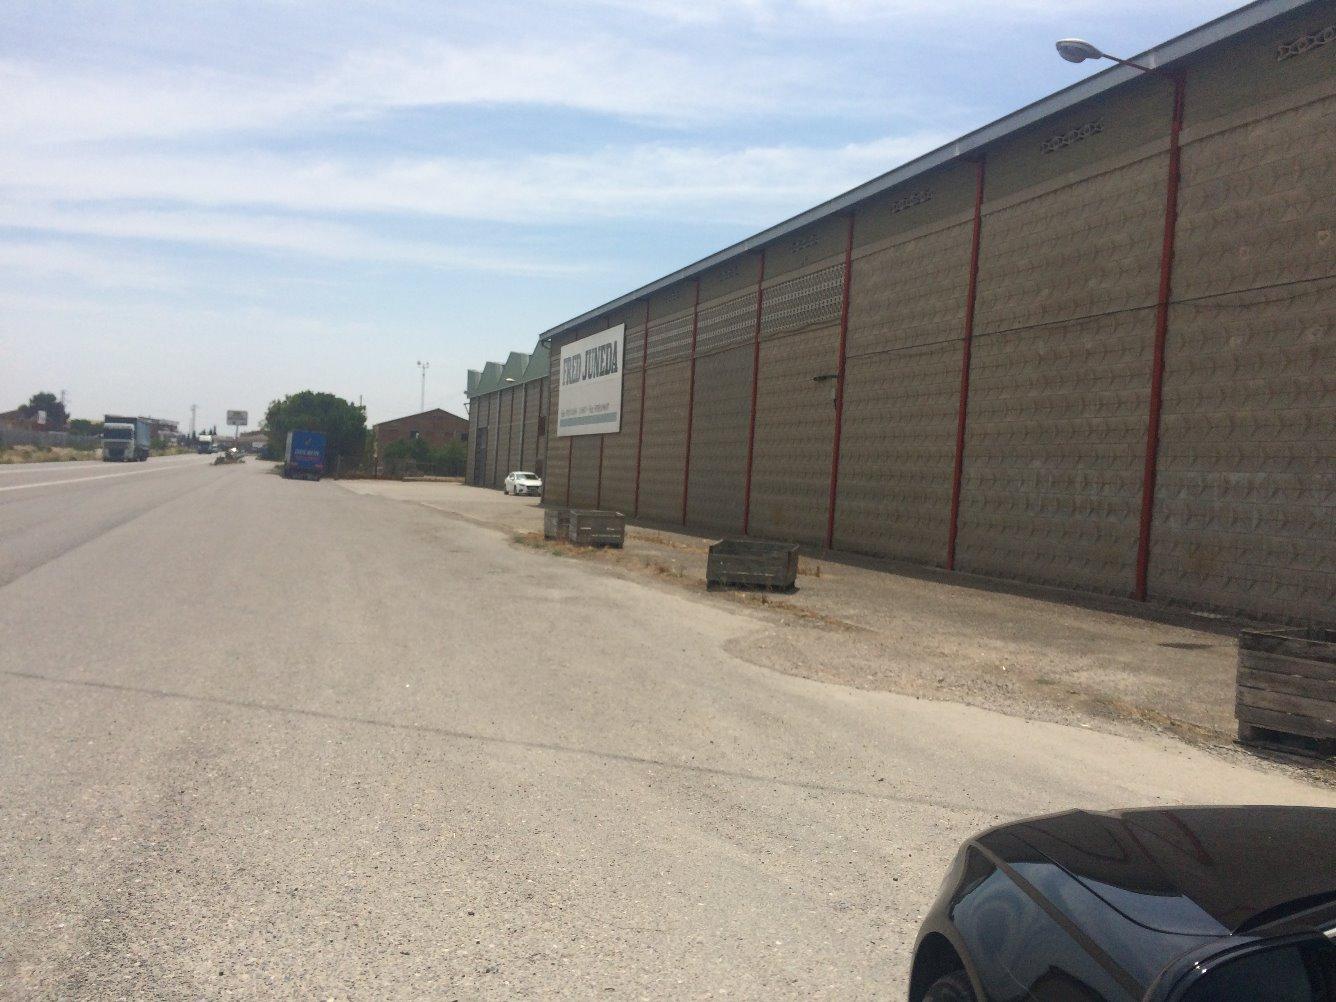 Nave industrial  Carretera ctra. n-240, km. 75,5